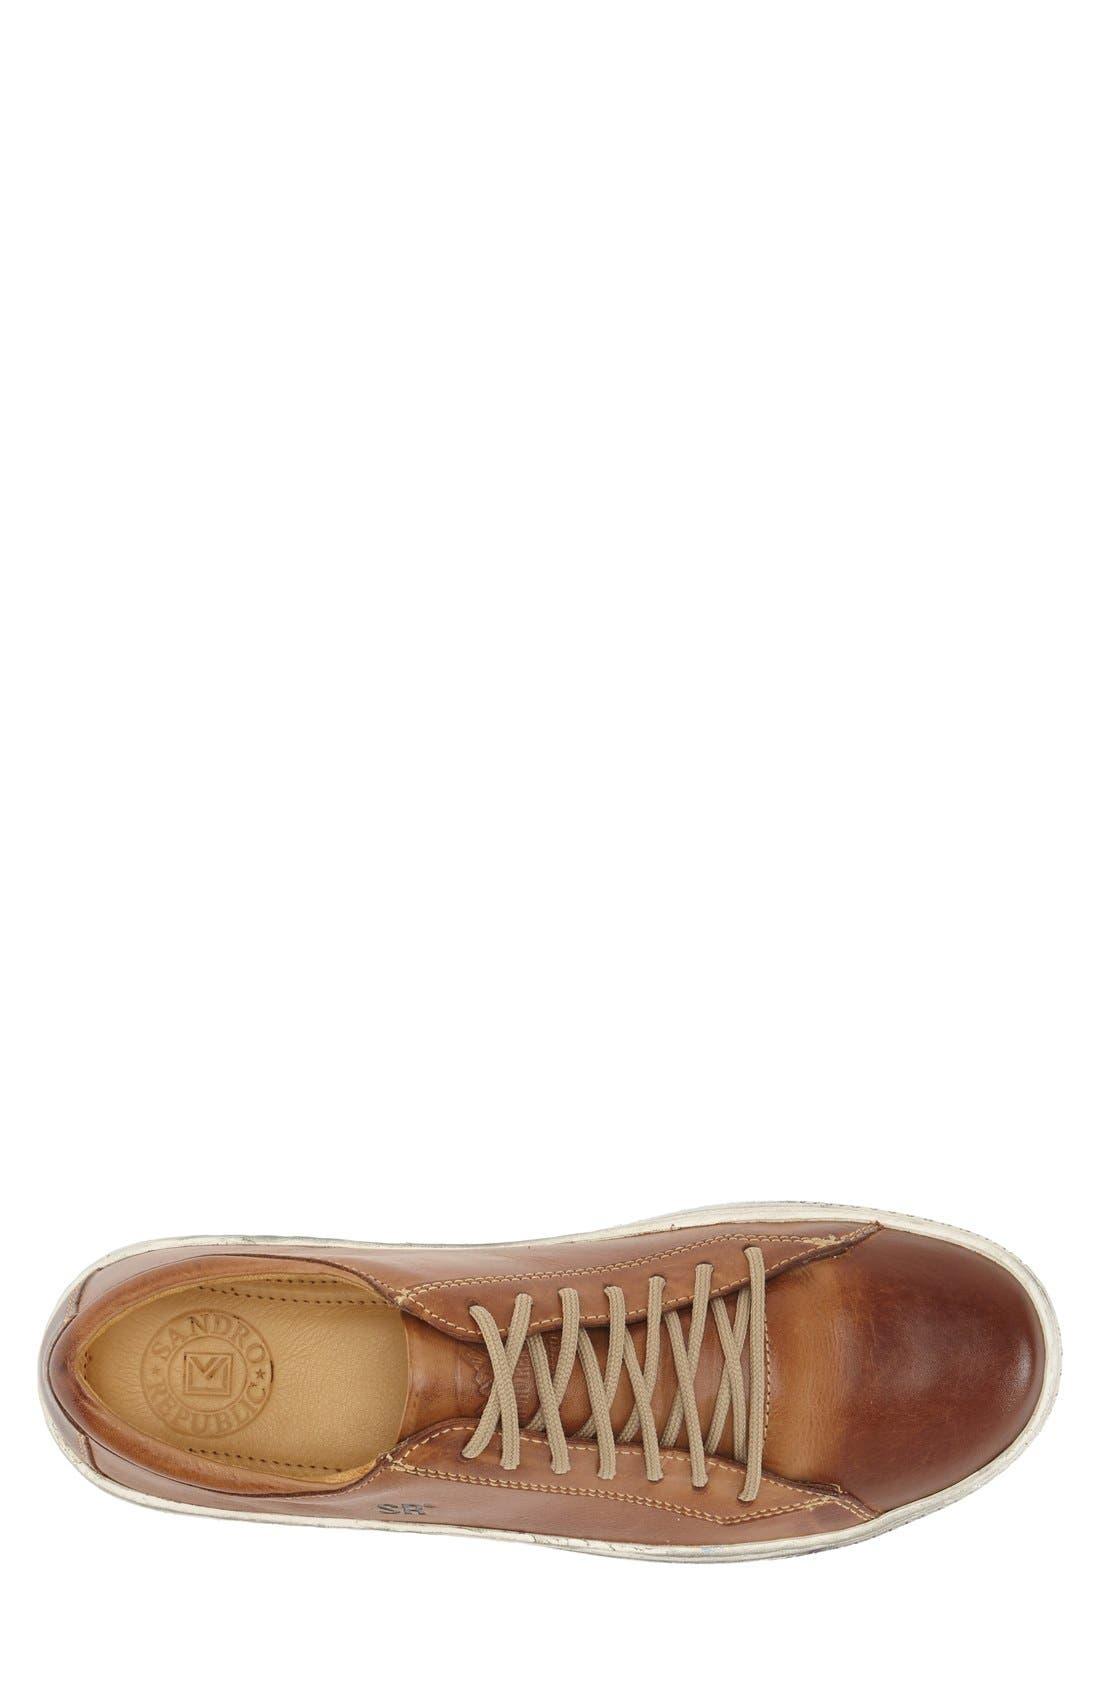 'Rolly' Sneaker,                             Alternate thumbnail 3, color,                             Tan